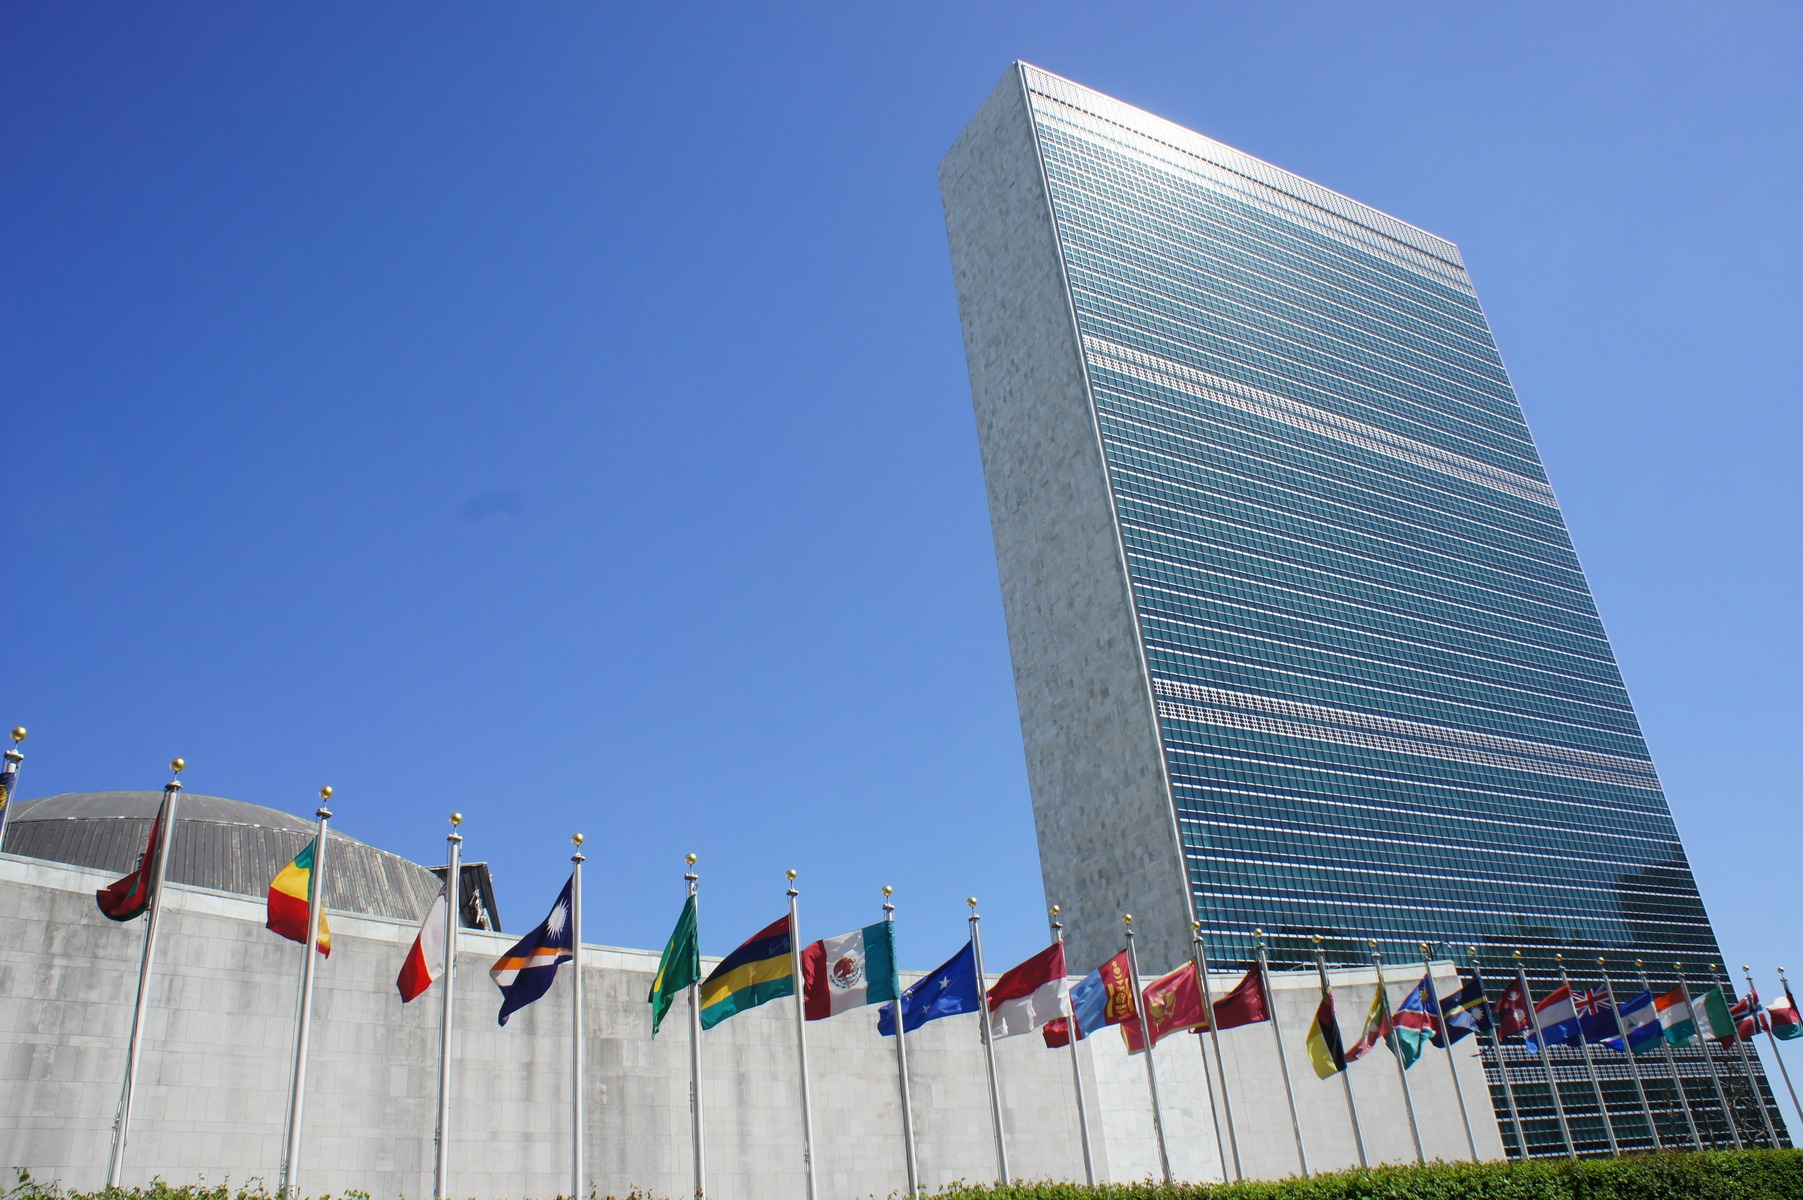 Explainer: Che cos'è e come funziona l'ONU